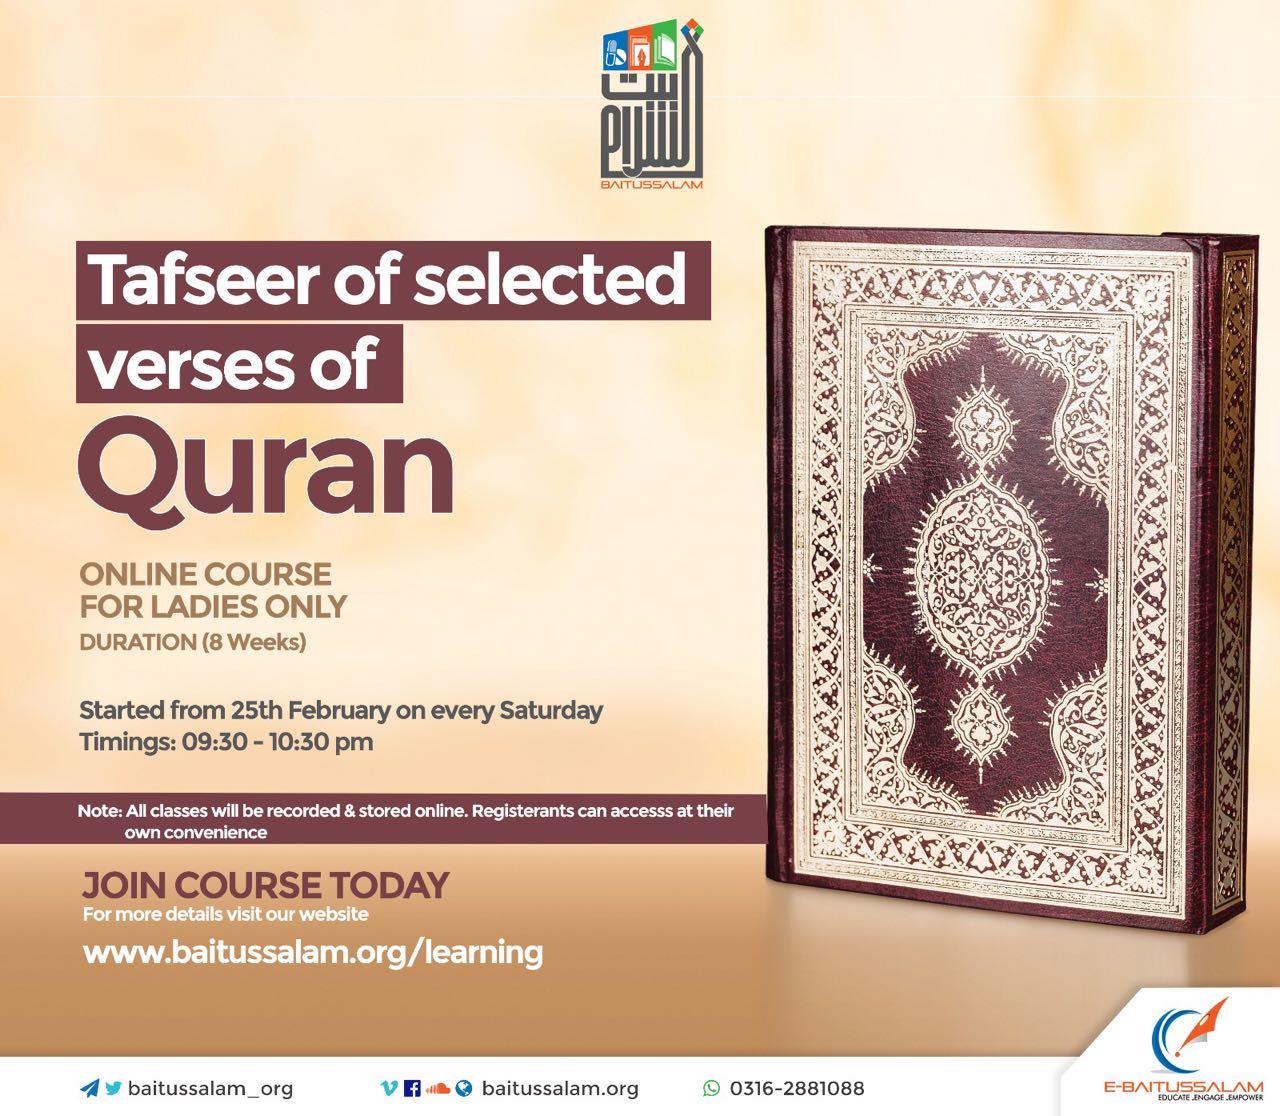 Muntakhab Ayat Ki Tafseer - For Women, Starting 25 Feb 2017  منتخب آیات کی تفسیر